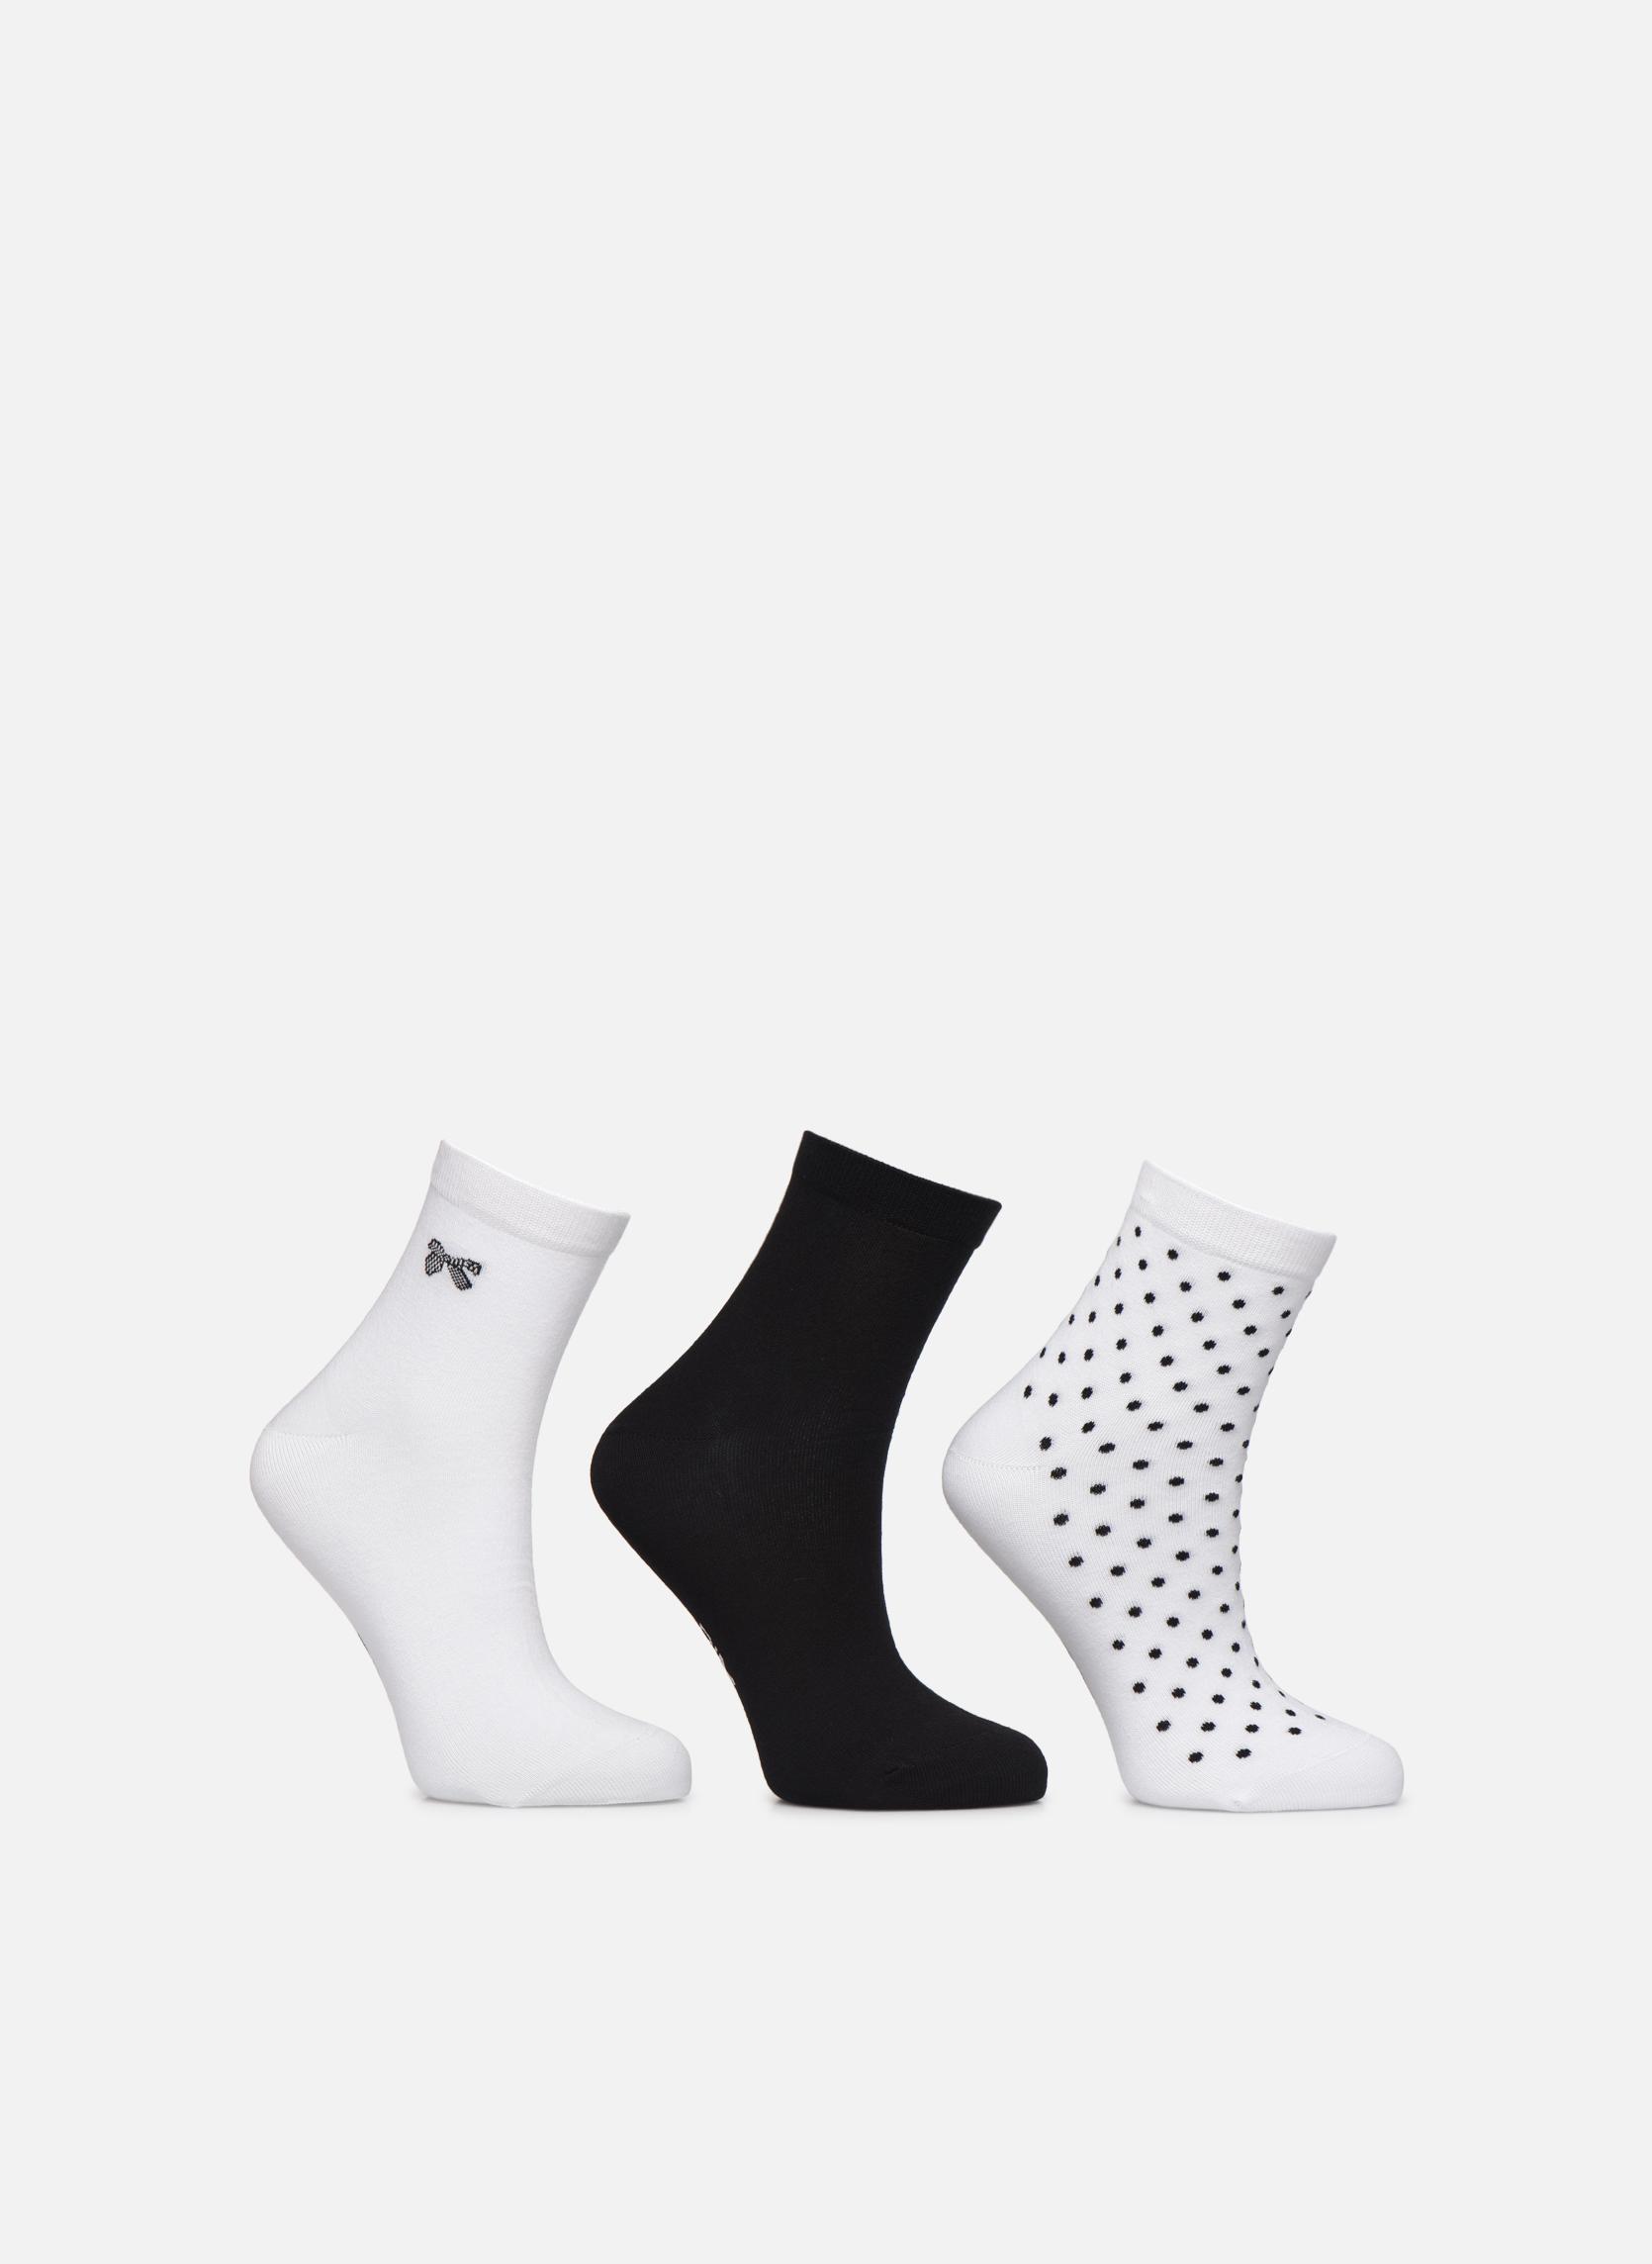 Socken & Strumpfhosen Accessoires Socquettes Pois & Noeuds Pack de 3